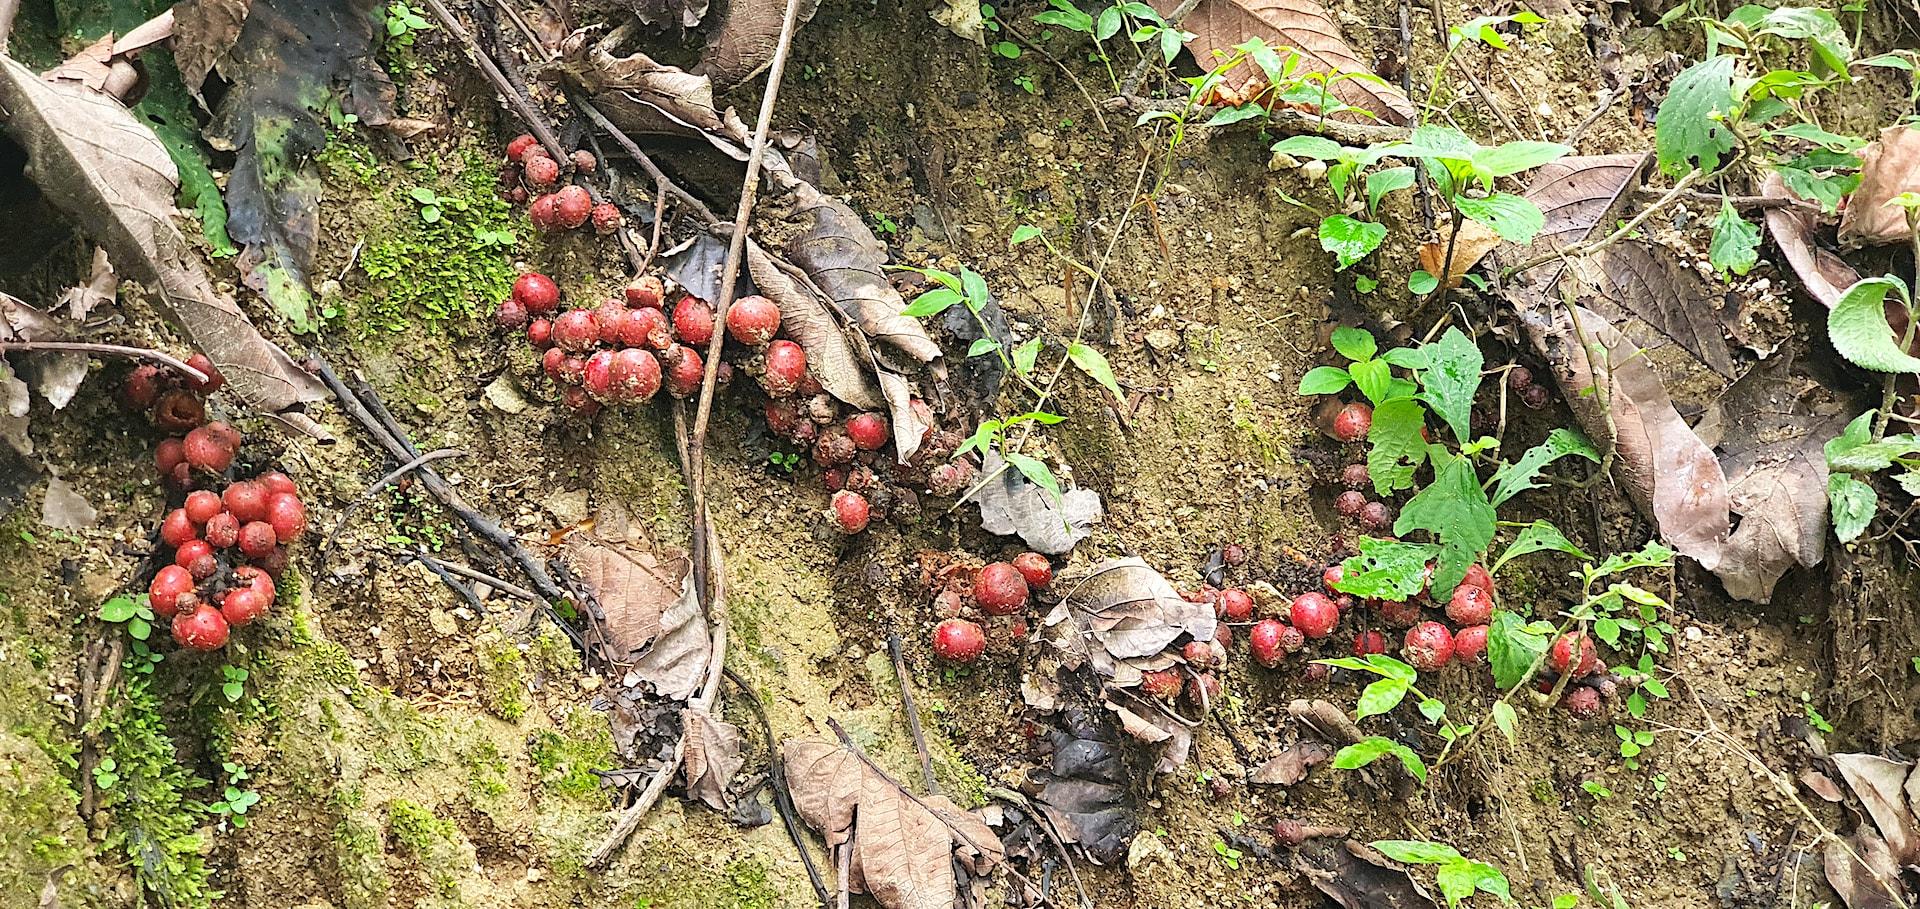 arunachal-pradesh-ripe-fig-fruits-on-forest-floor-food-for-impressed-tortoise